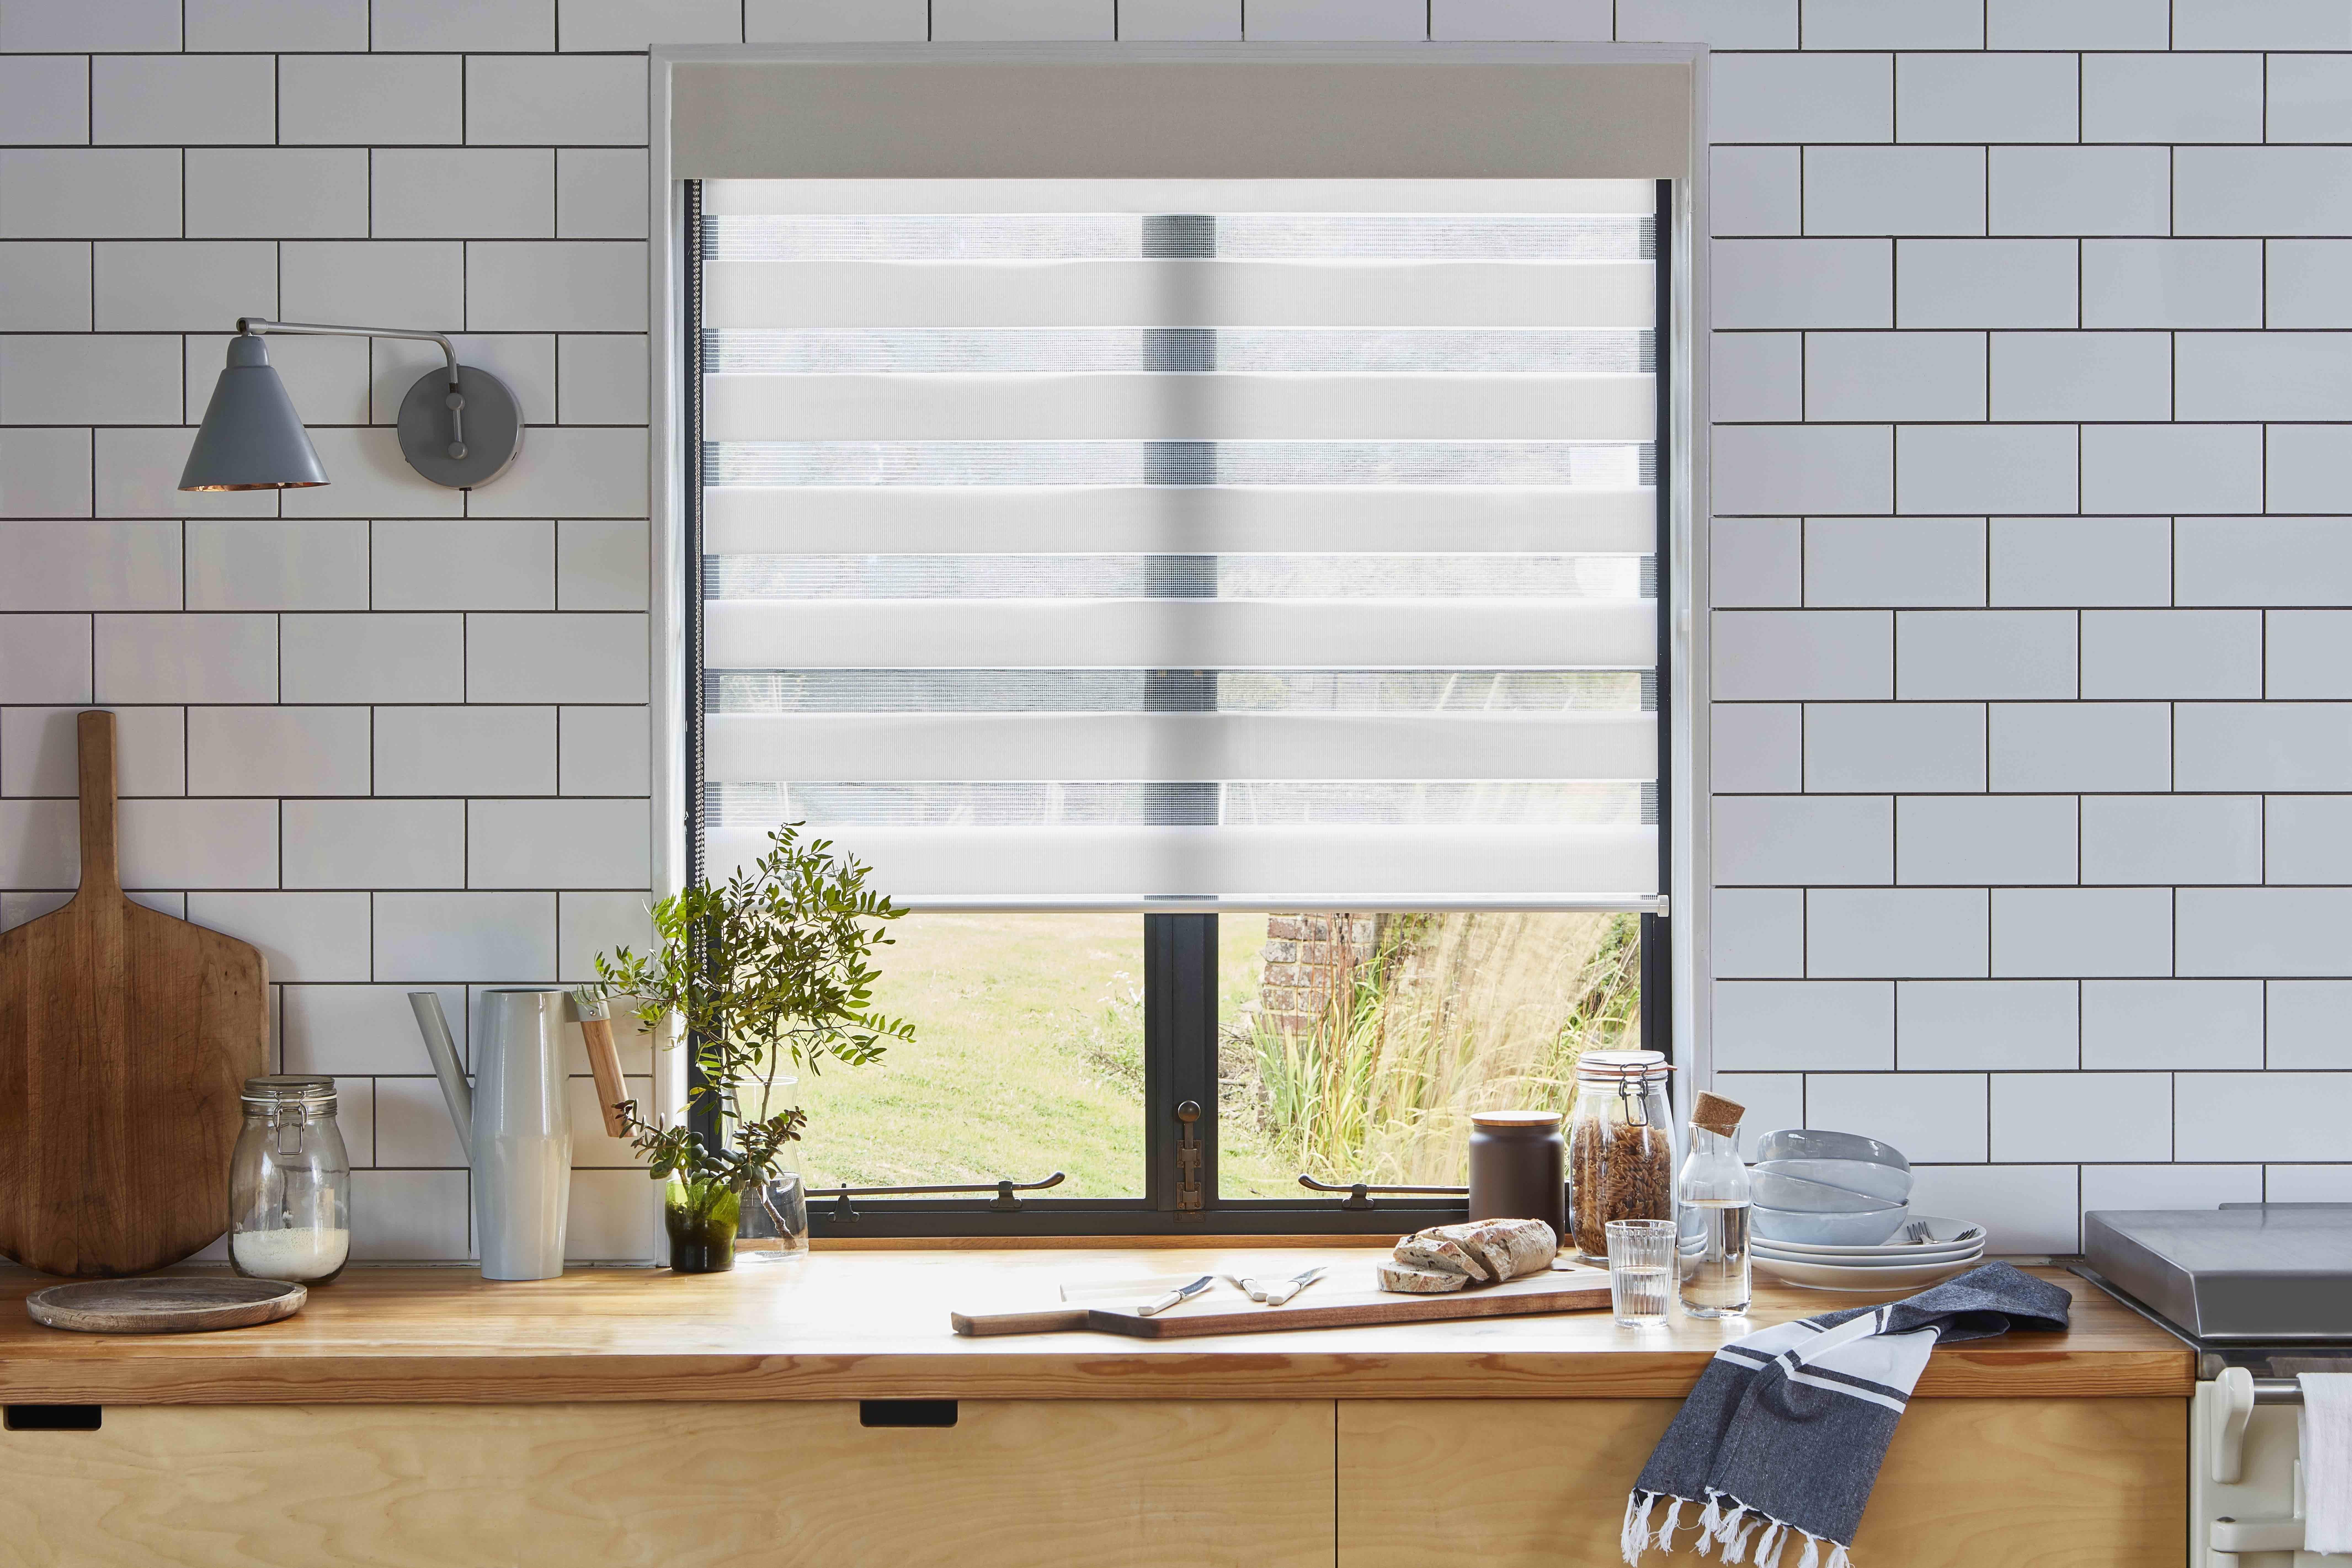 4 Wondrous Ideas Grey Shutter Blinds Electric Blinds For Windows Roller Blinds Furniture Fabric Blinds Project Blinds Design Kitchen Blinds Living Room Blinds